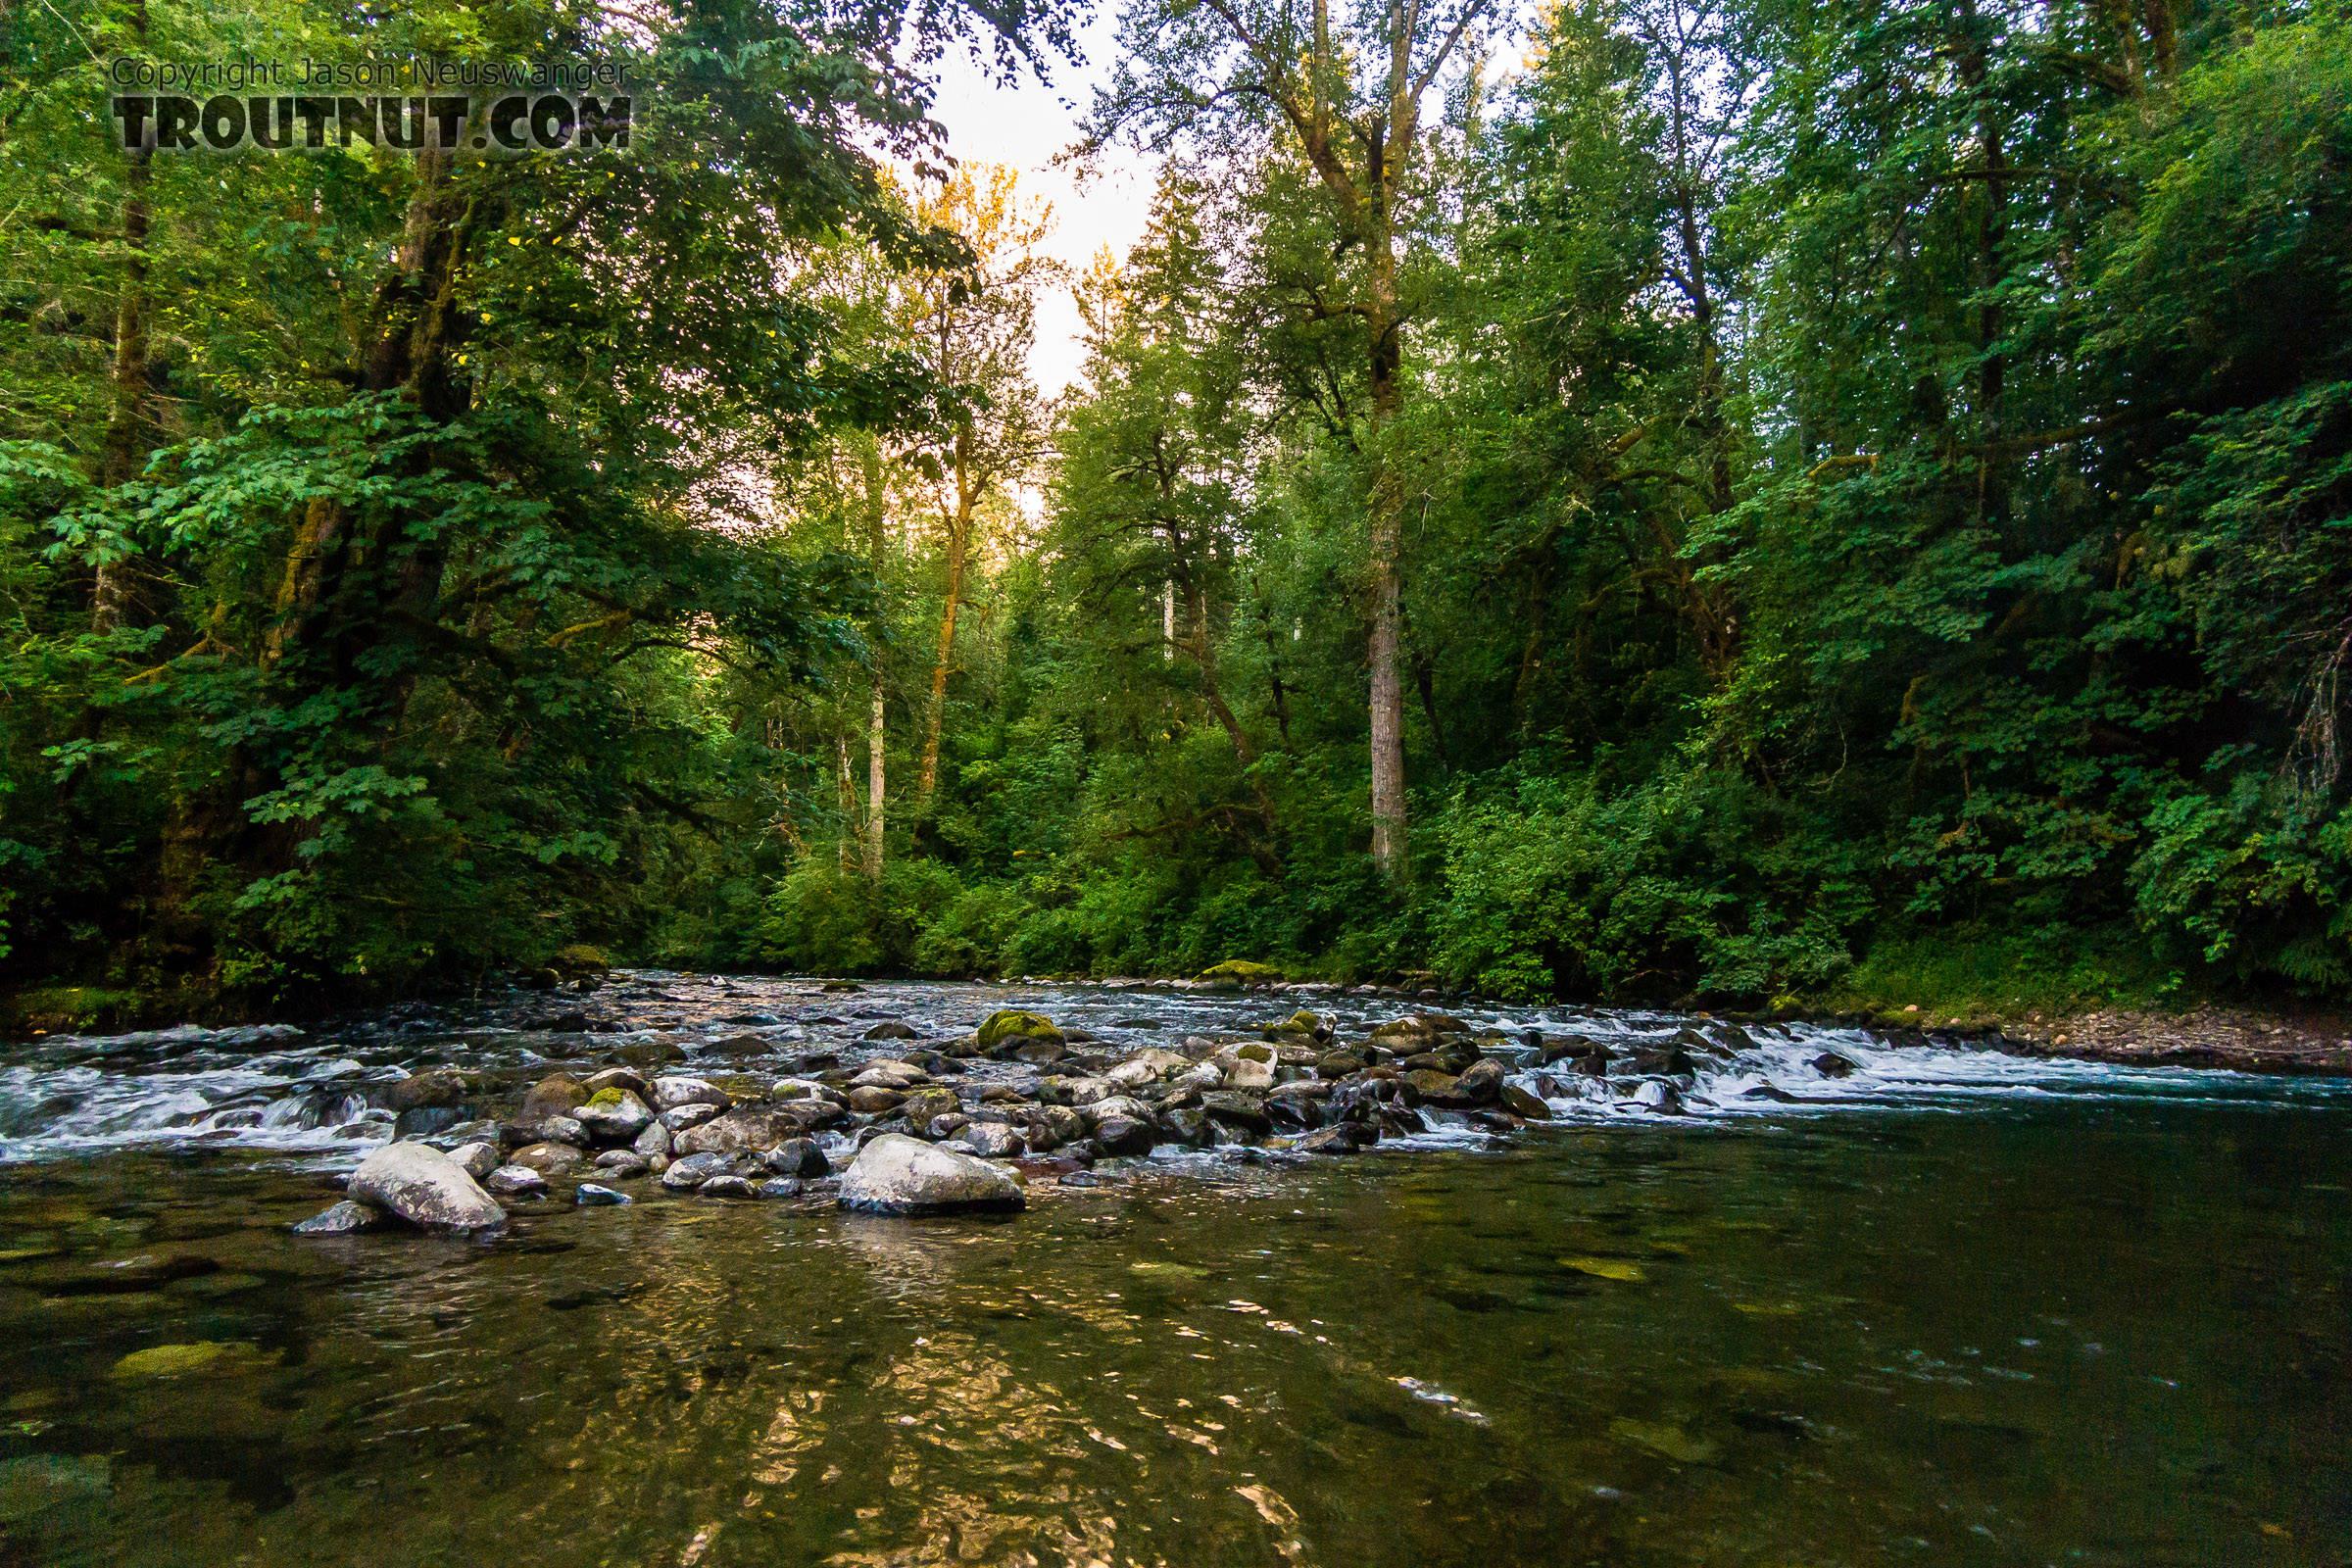 From the Cedar River in Washington.